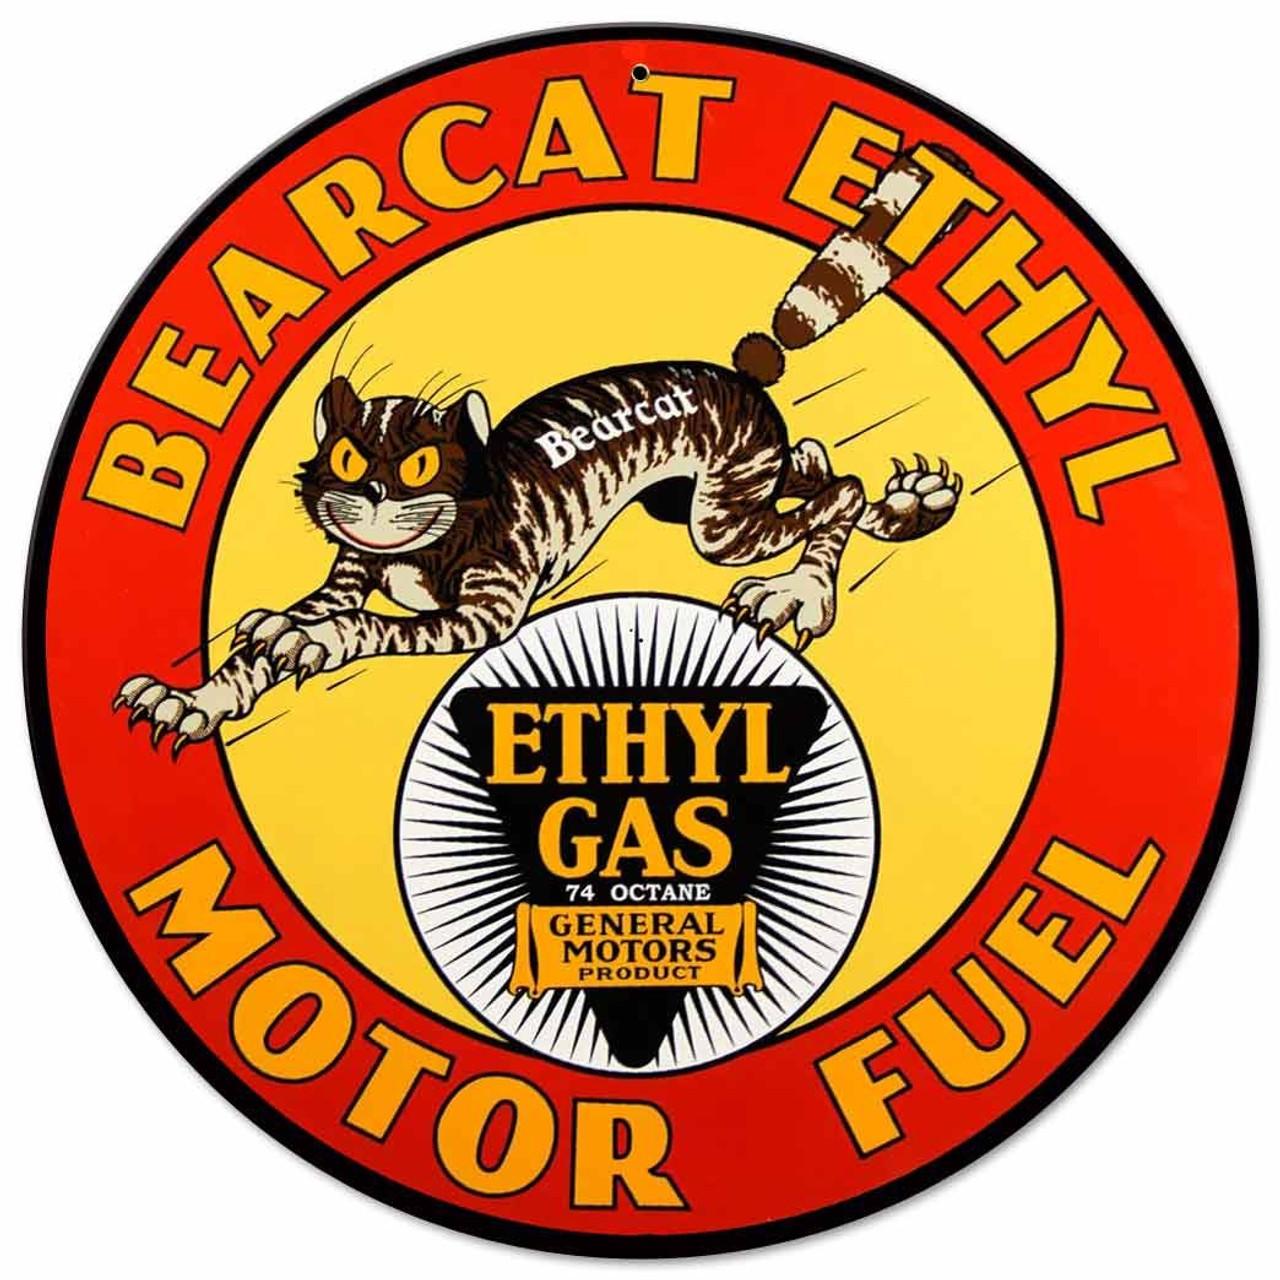 Bearcat Ethyl Gas Metal Sign 14 x 14 Inches